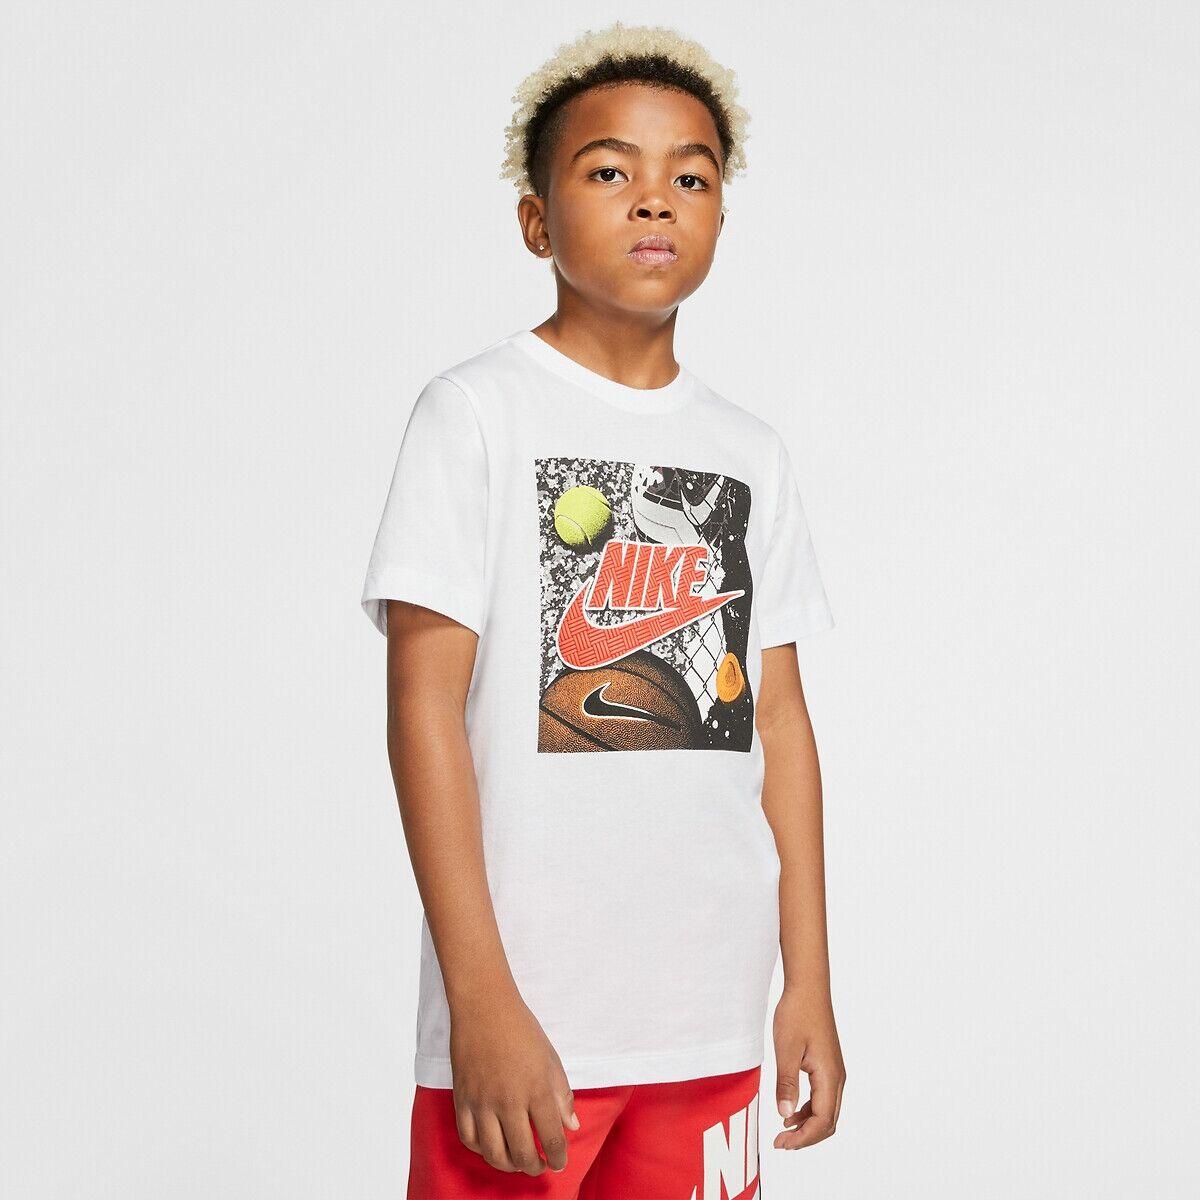 NIKE T-shirt 6 - 16 ans